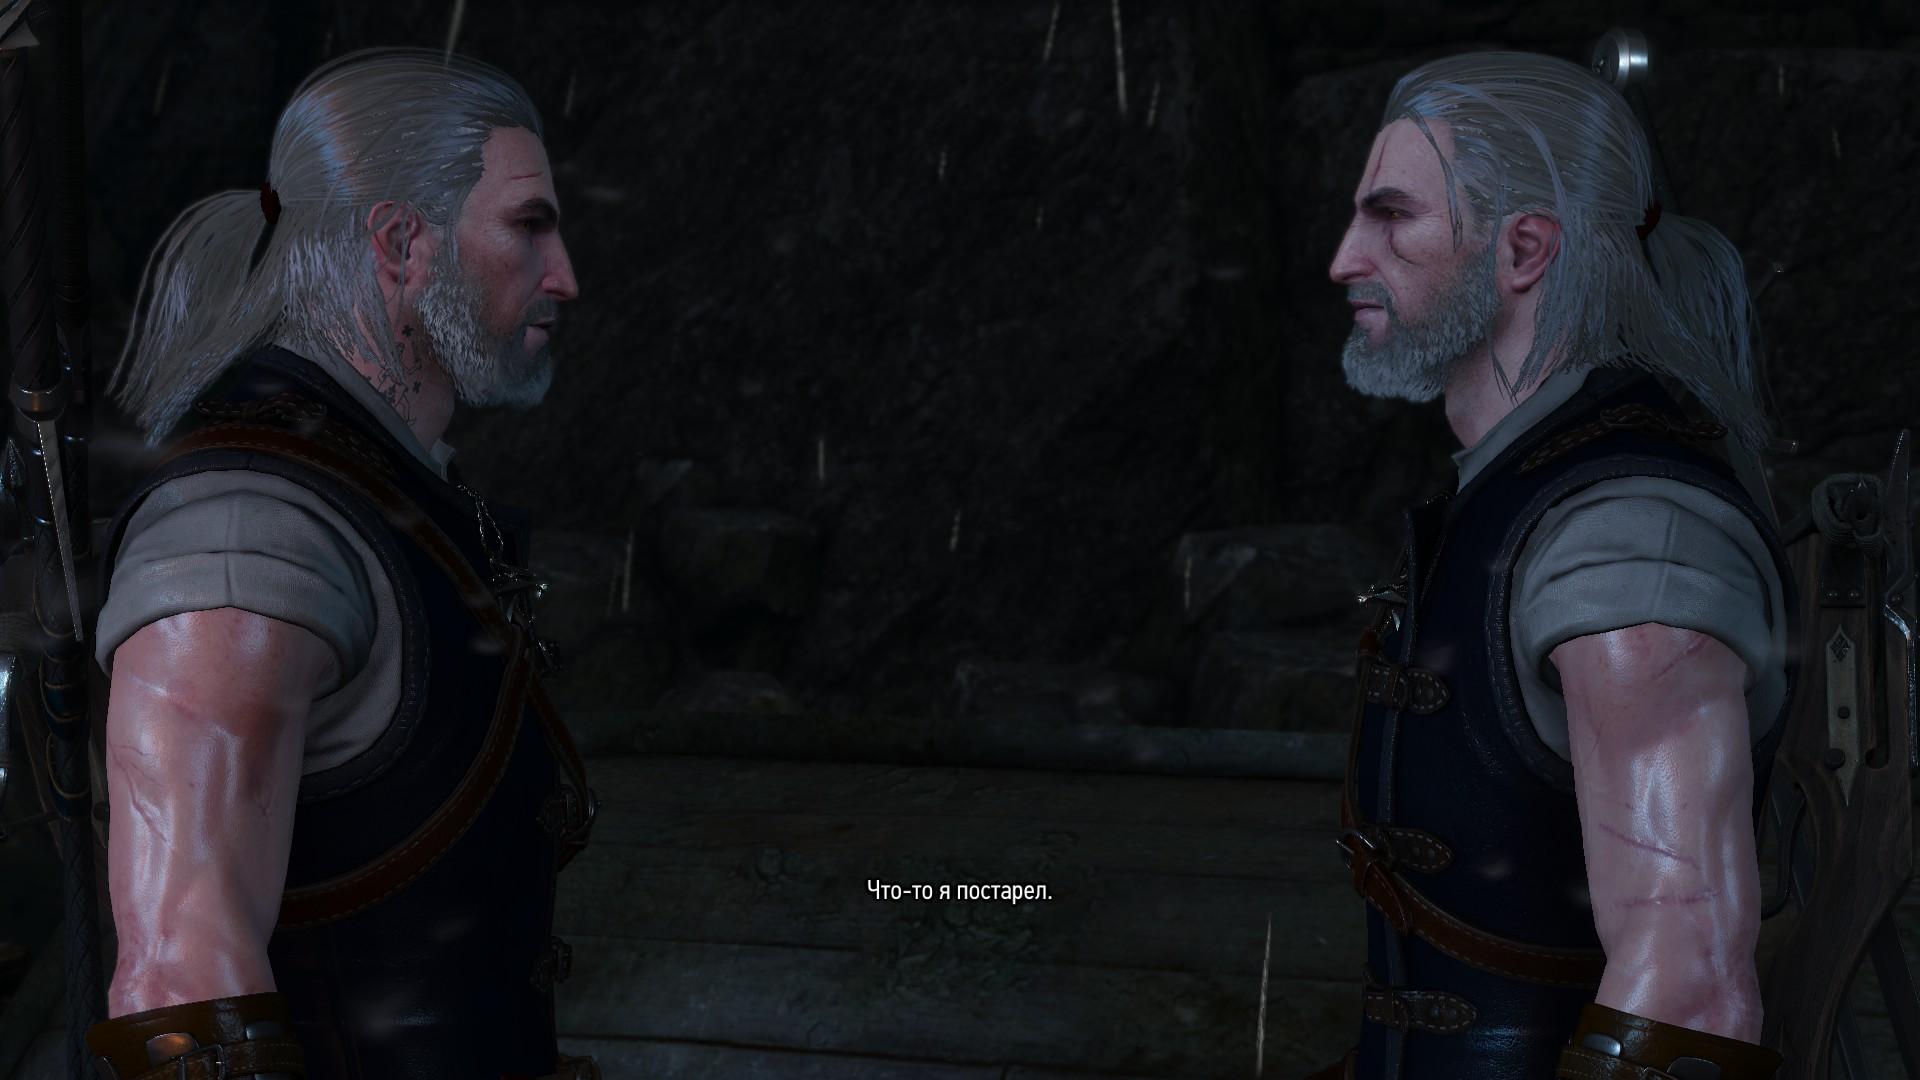 Геральт - Witcher 3: Wild Hunt, the